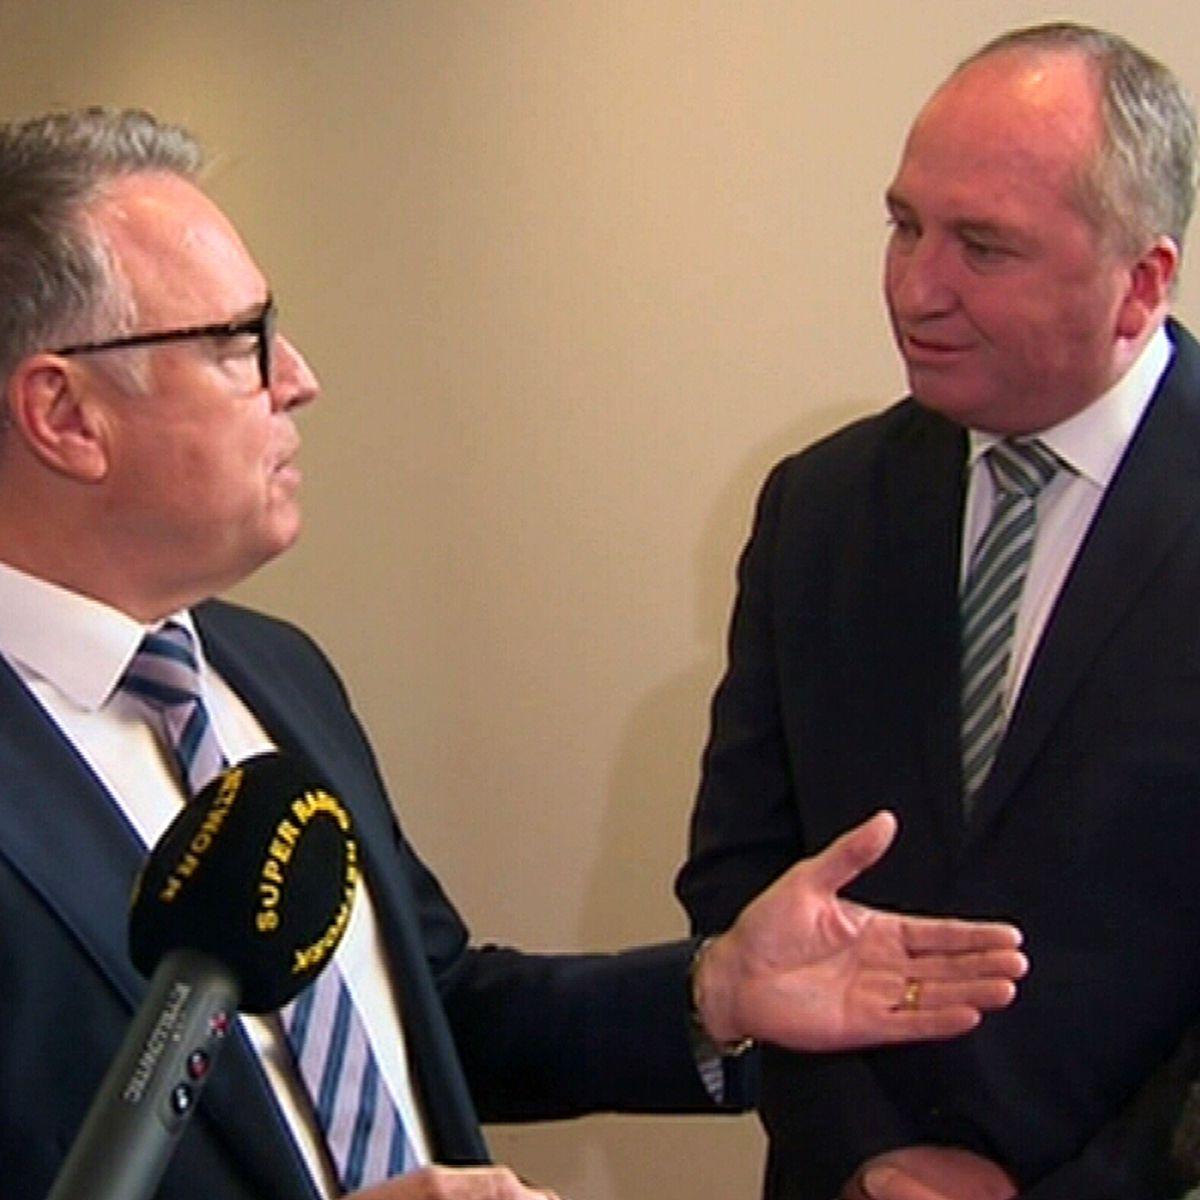 Joyce and Fitzgibbon's corridor clash over net-zero emissions